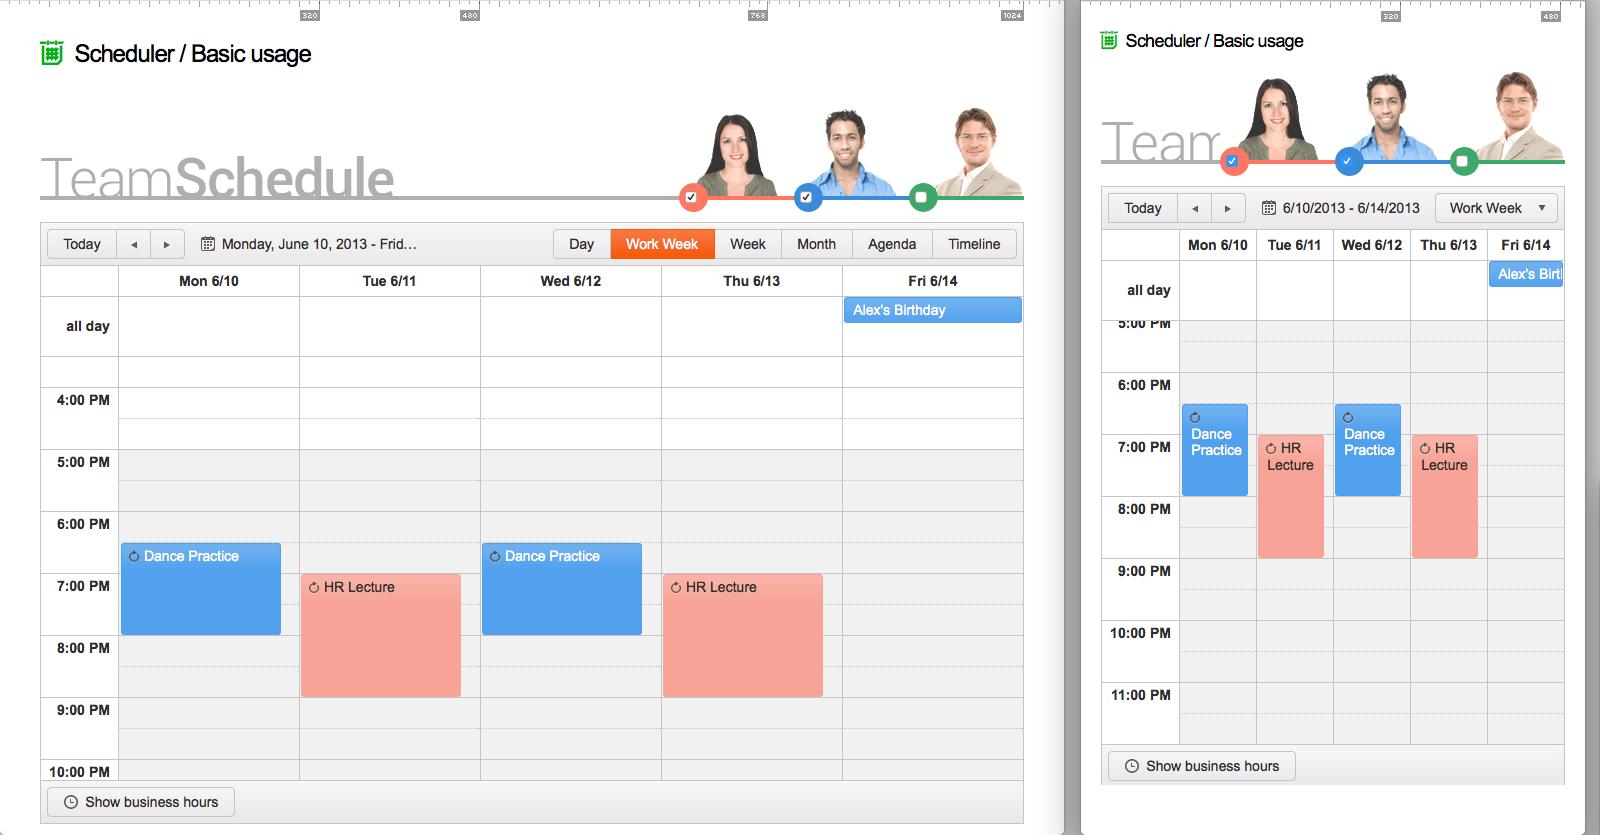 Screenshot 2015-07-02 14.32.14